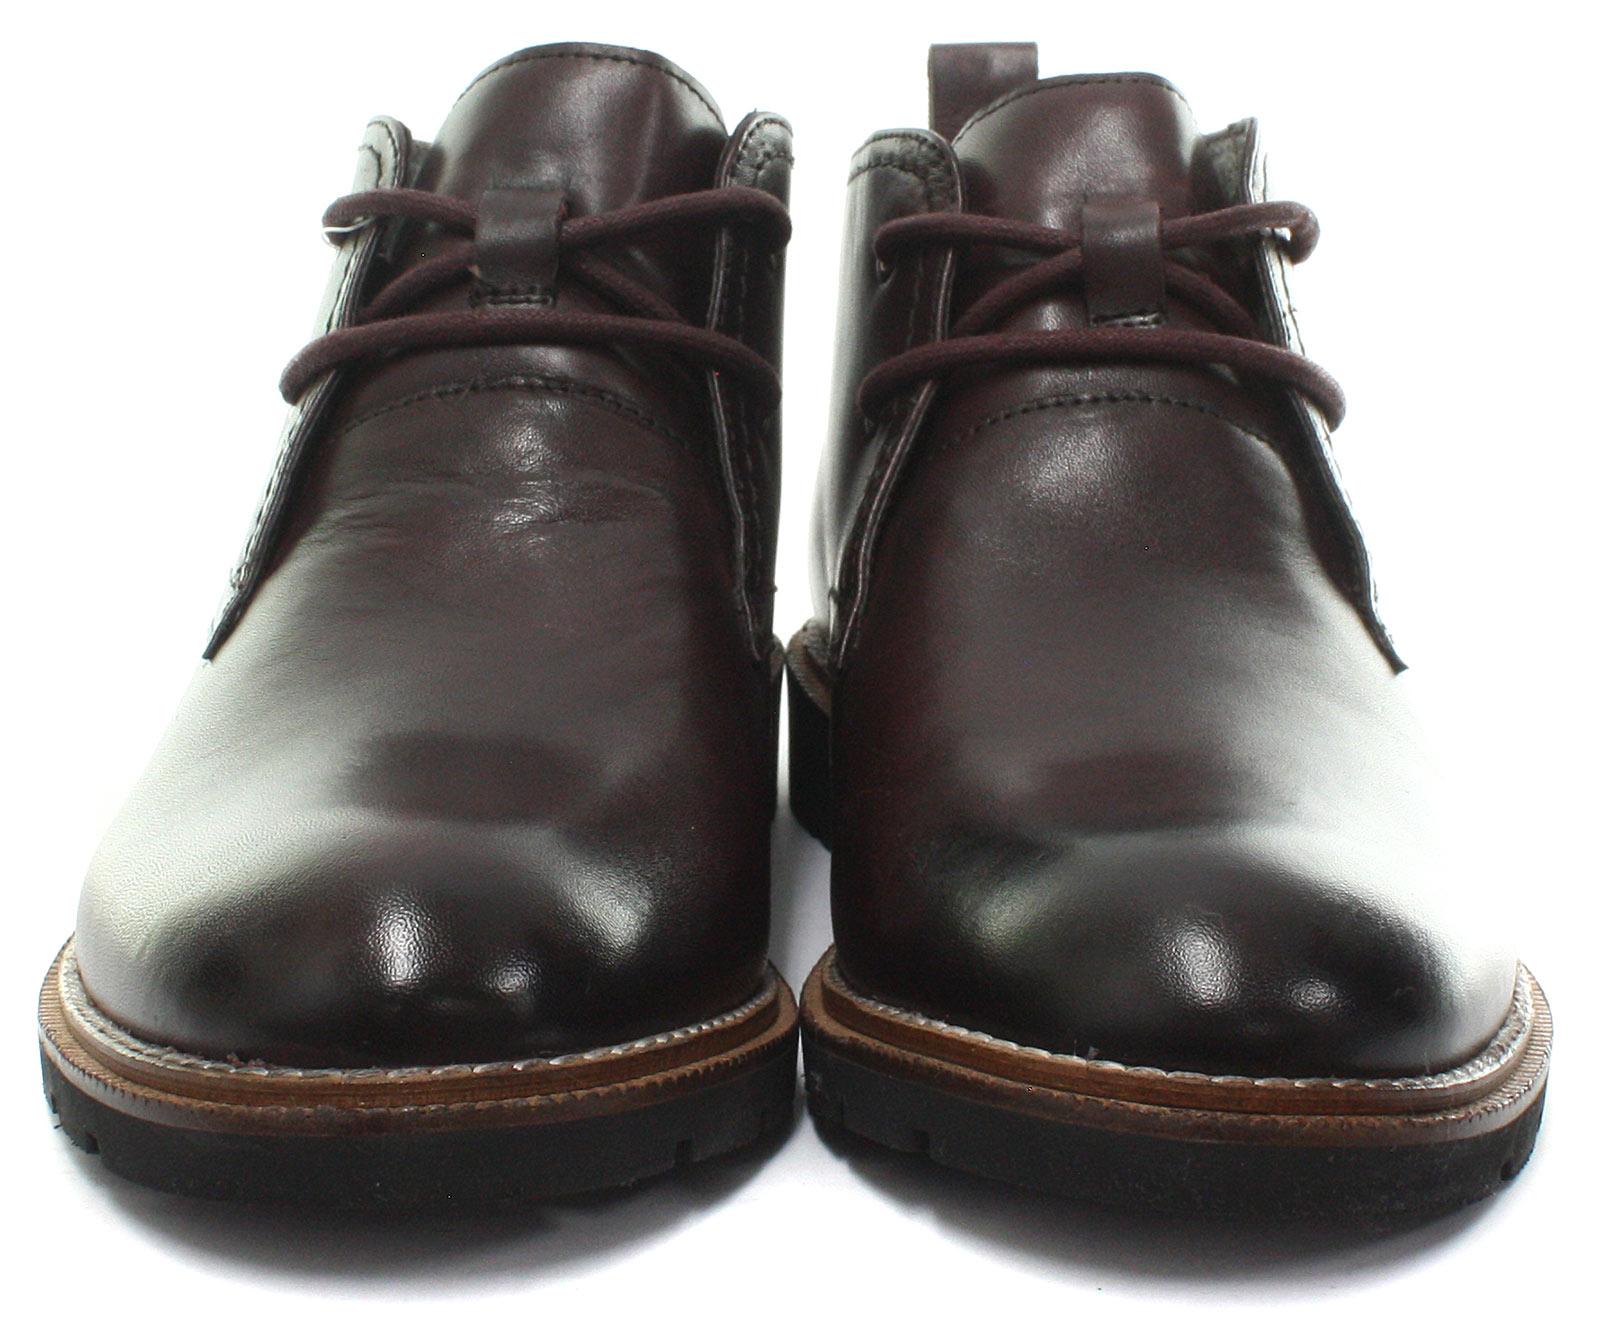 New-Roamers-2-Eye-Mens-Chukka-Boots-ALL-SIZES miniature 2